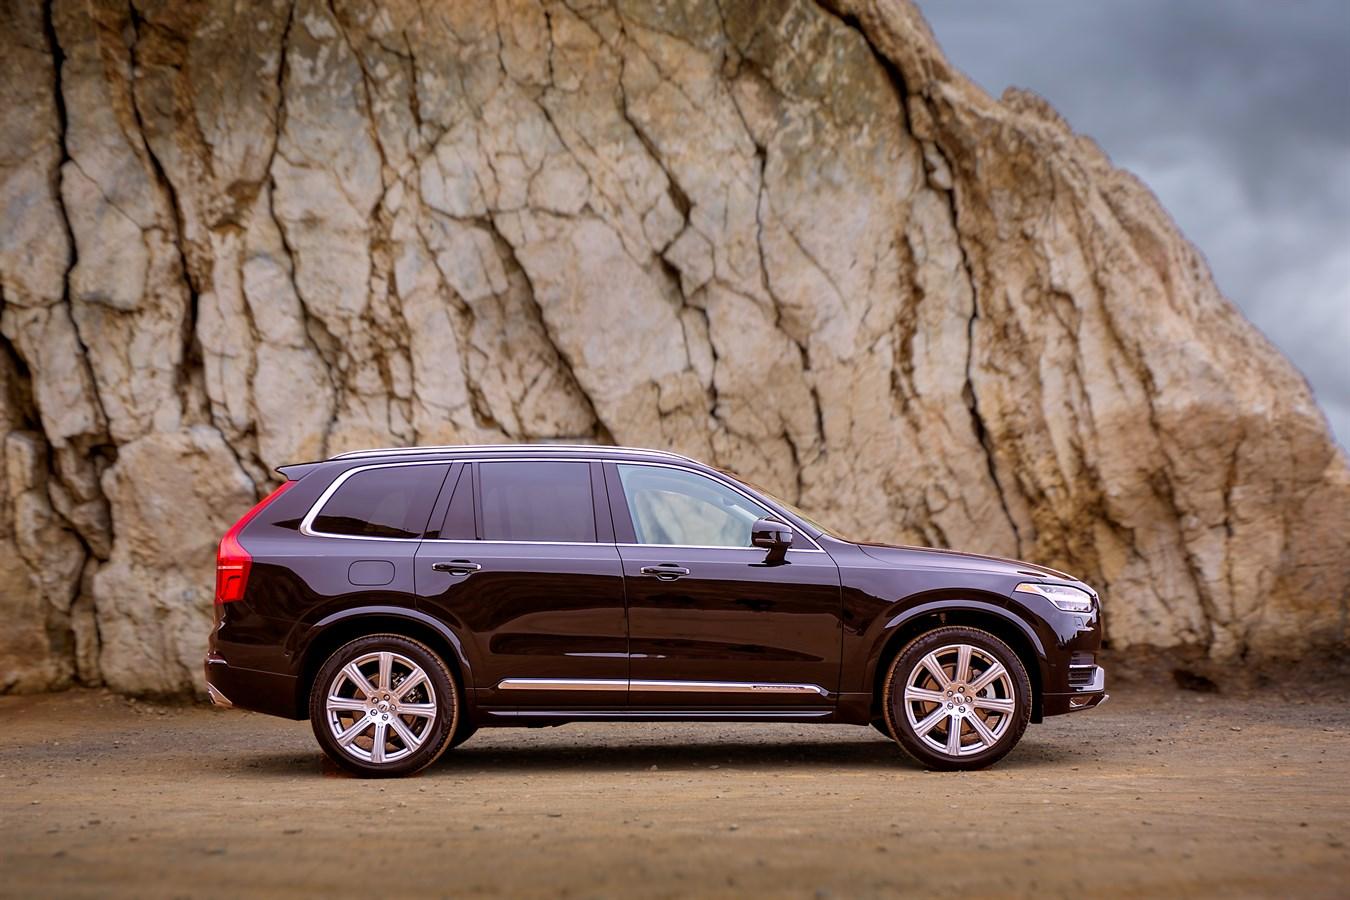 Volvo Xc90 Model Year 2017 Volvo Car Austria Pressezentrum